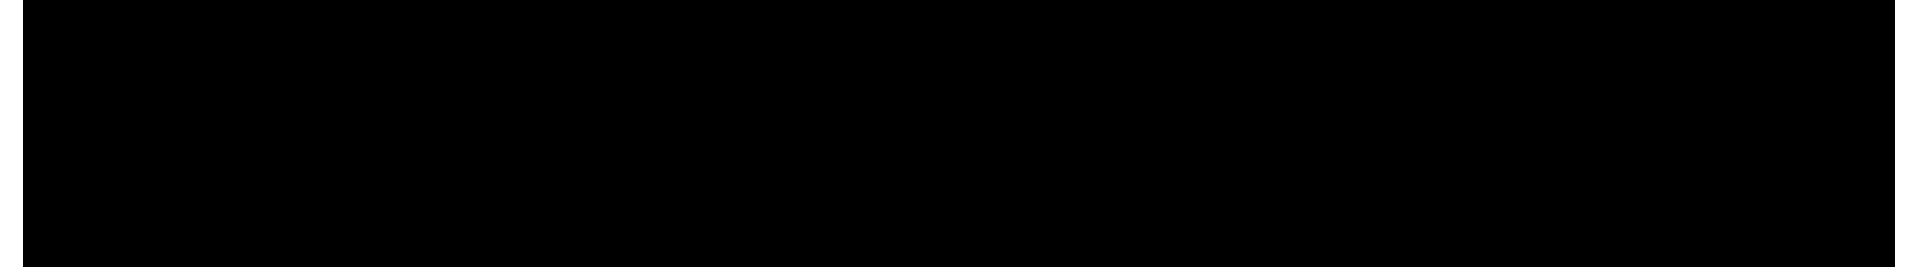 Sharp Logo- FlatFrog Hardware Partner